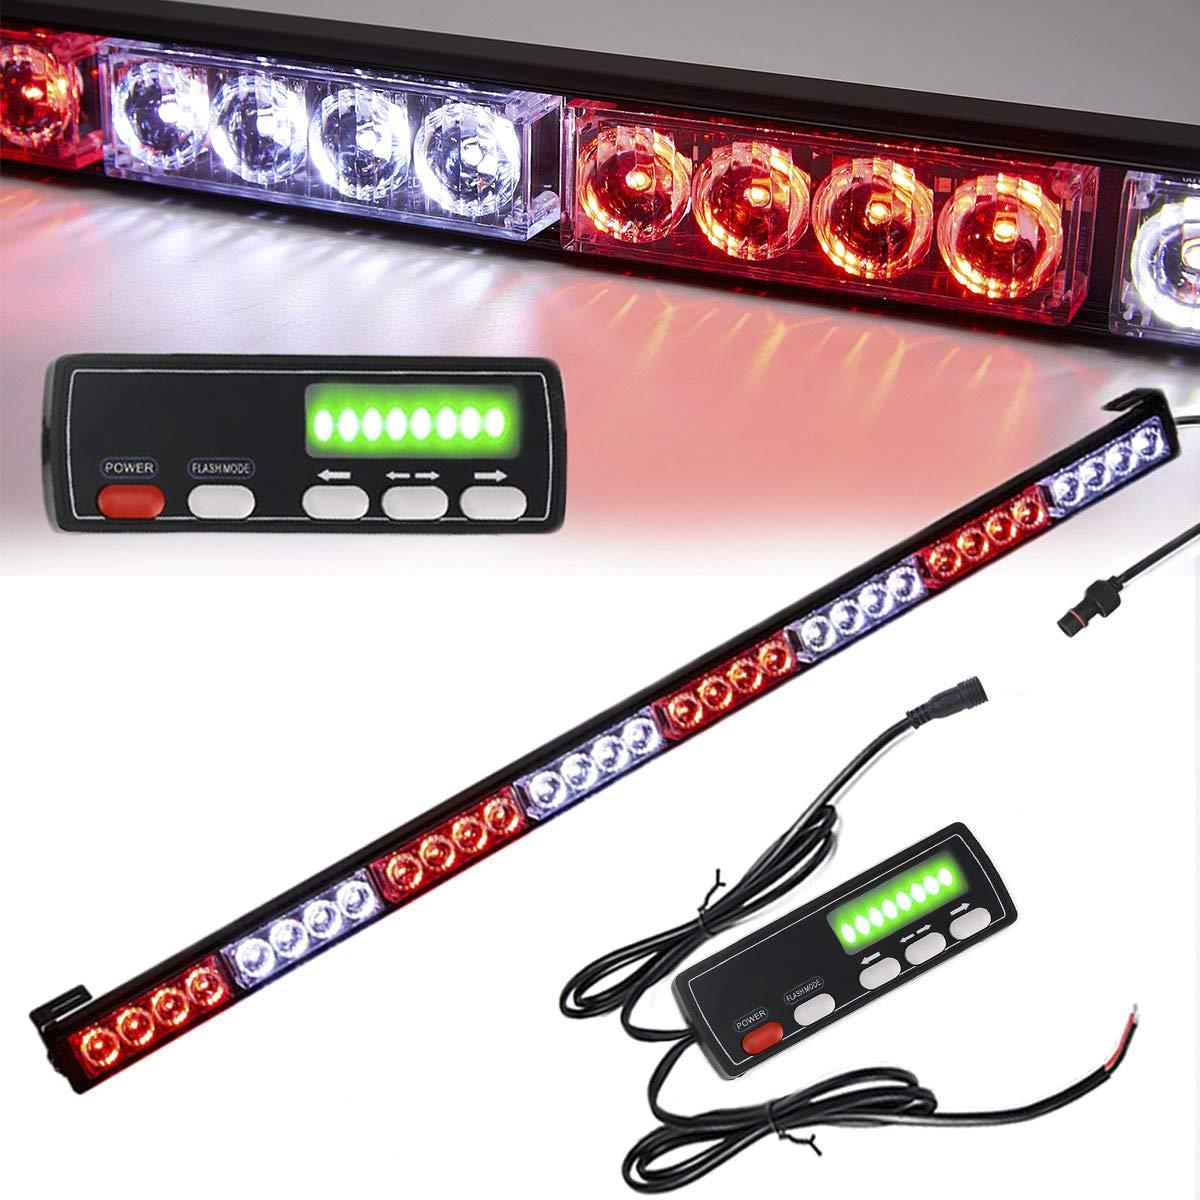 Led Strobe Light Bar 35.5 Inch 16 Flash Modes 32 Led Strobe Lights Traffic Advisor Directional Emergency Light Bar Flashing Safety Lights with Led Display Screen Controller(35.5 Inch, White/Red)